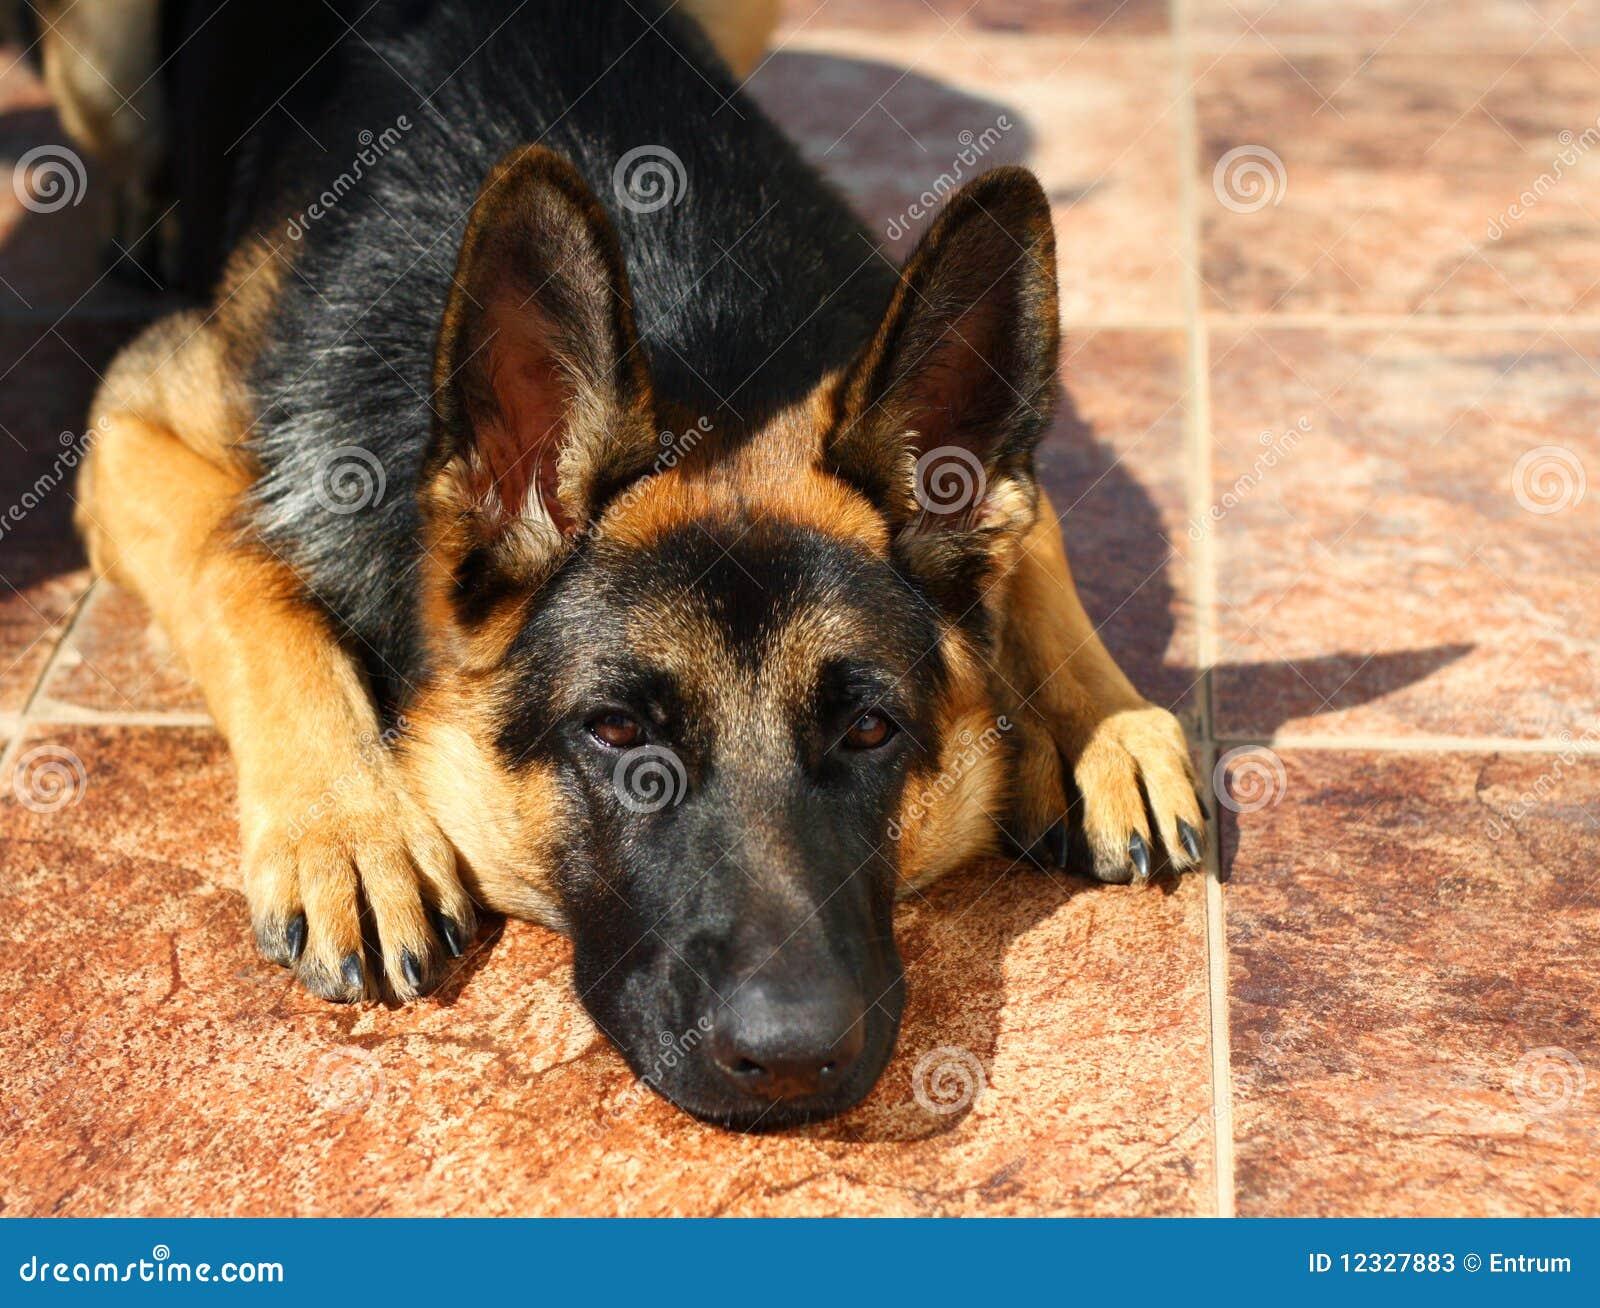 German Shepherd Dog Puppy Stock Photos Image 12327883